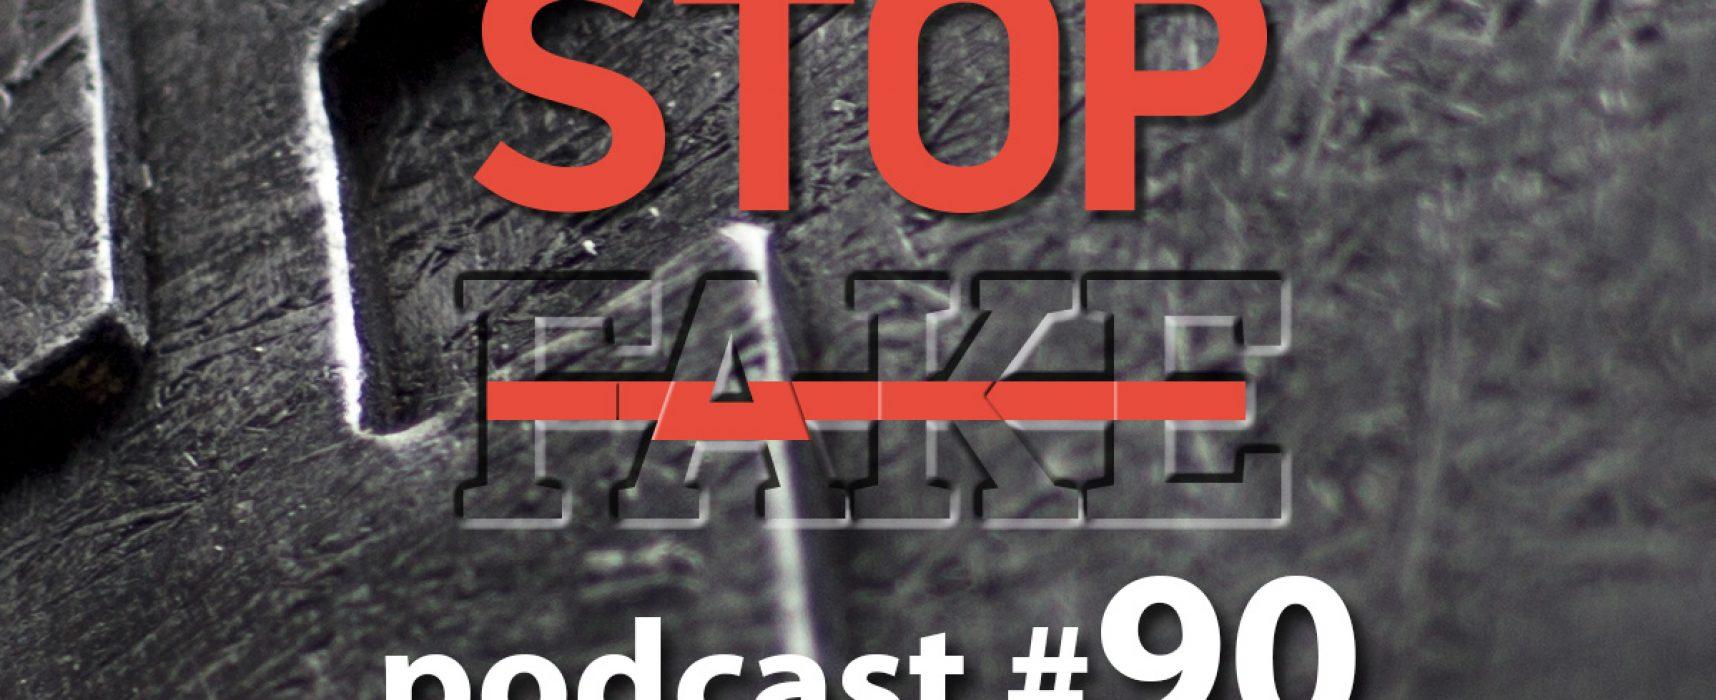 StopFake podcast #90